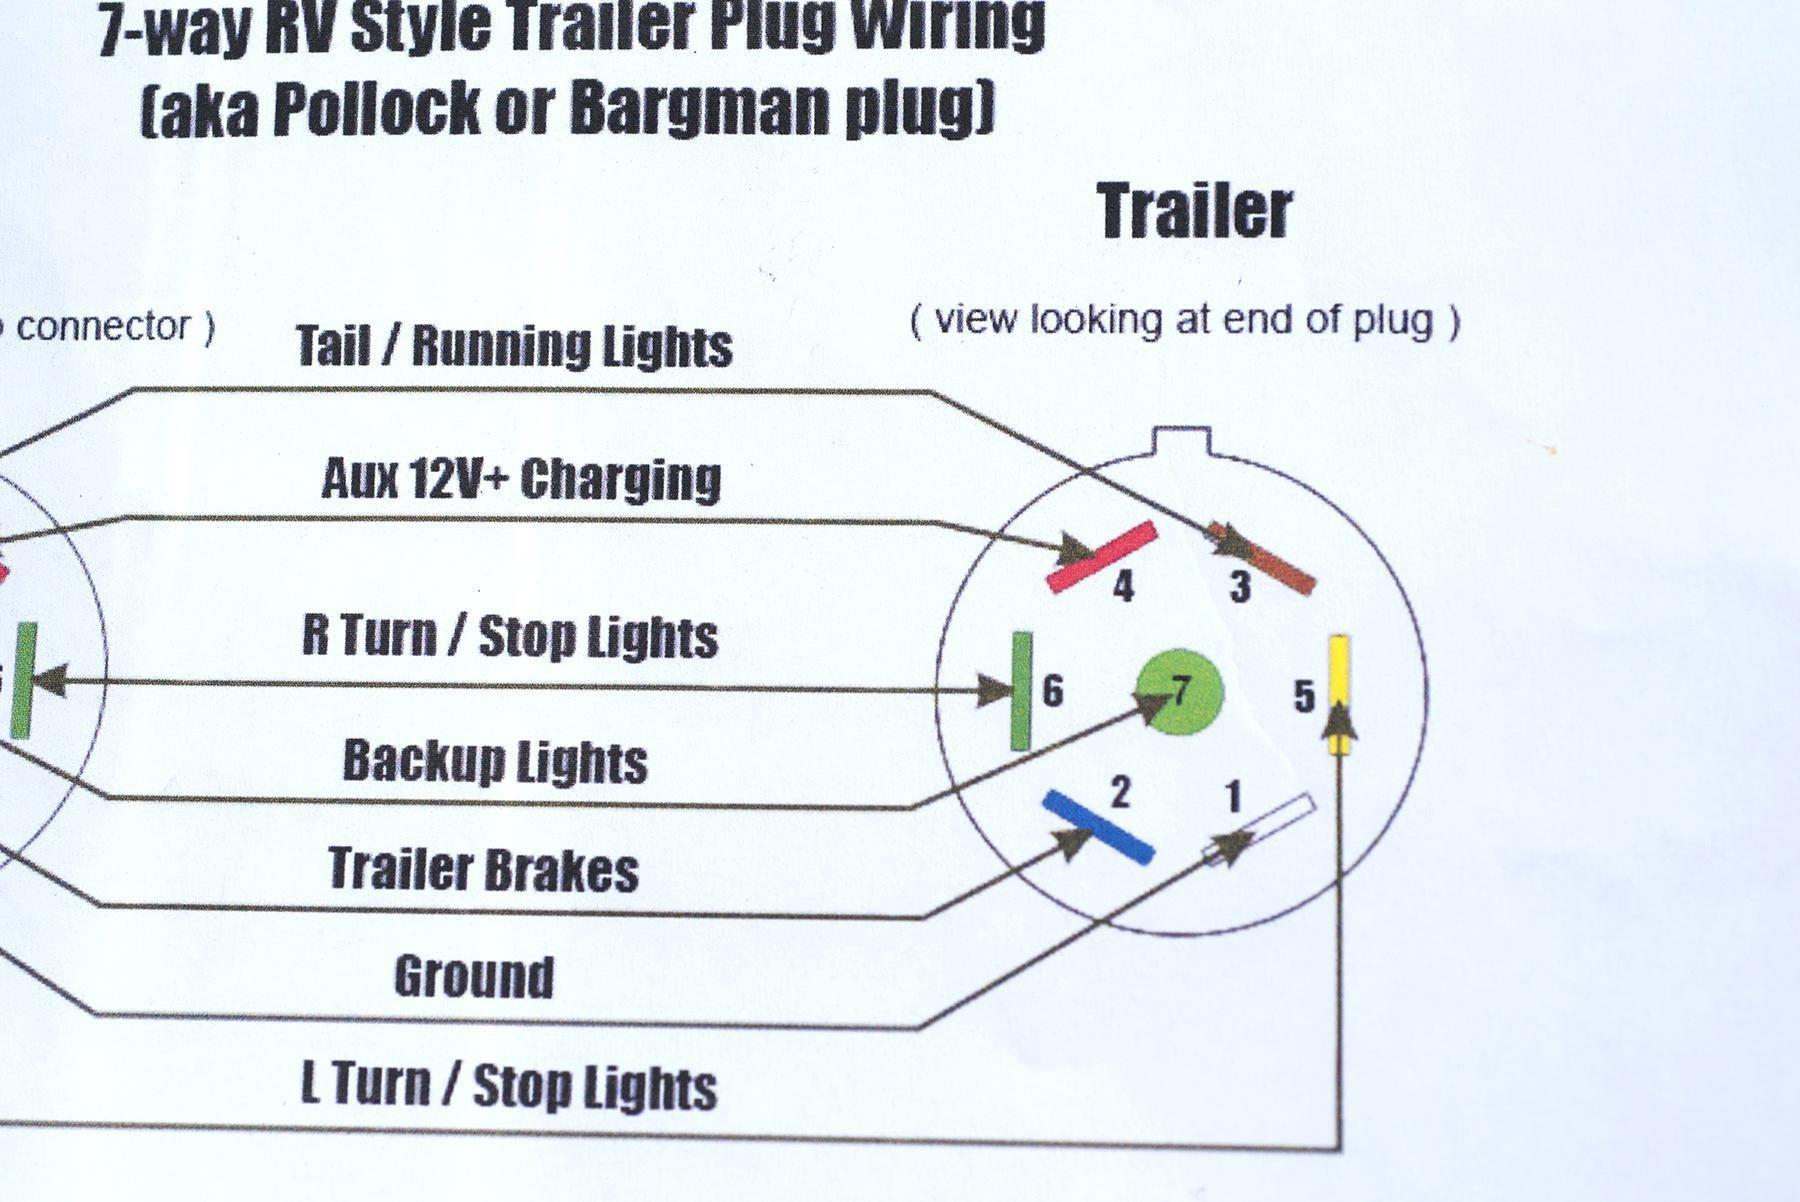 7 Way Flat Wiring Diagram - Wiring Block Diagram - Trailer Connector Wiring Diagram